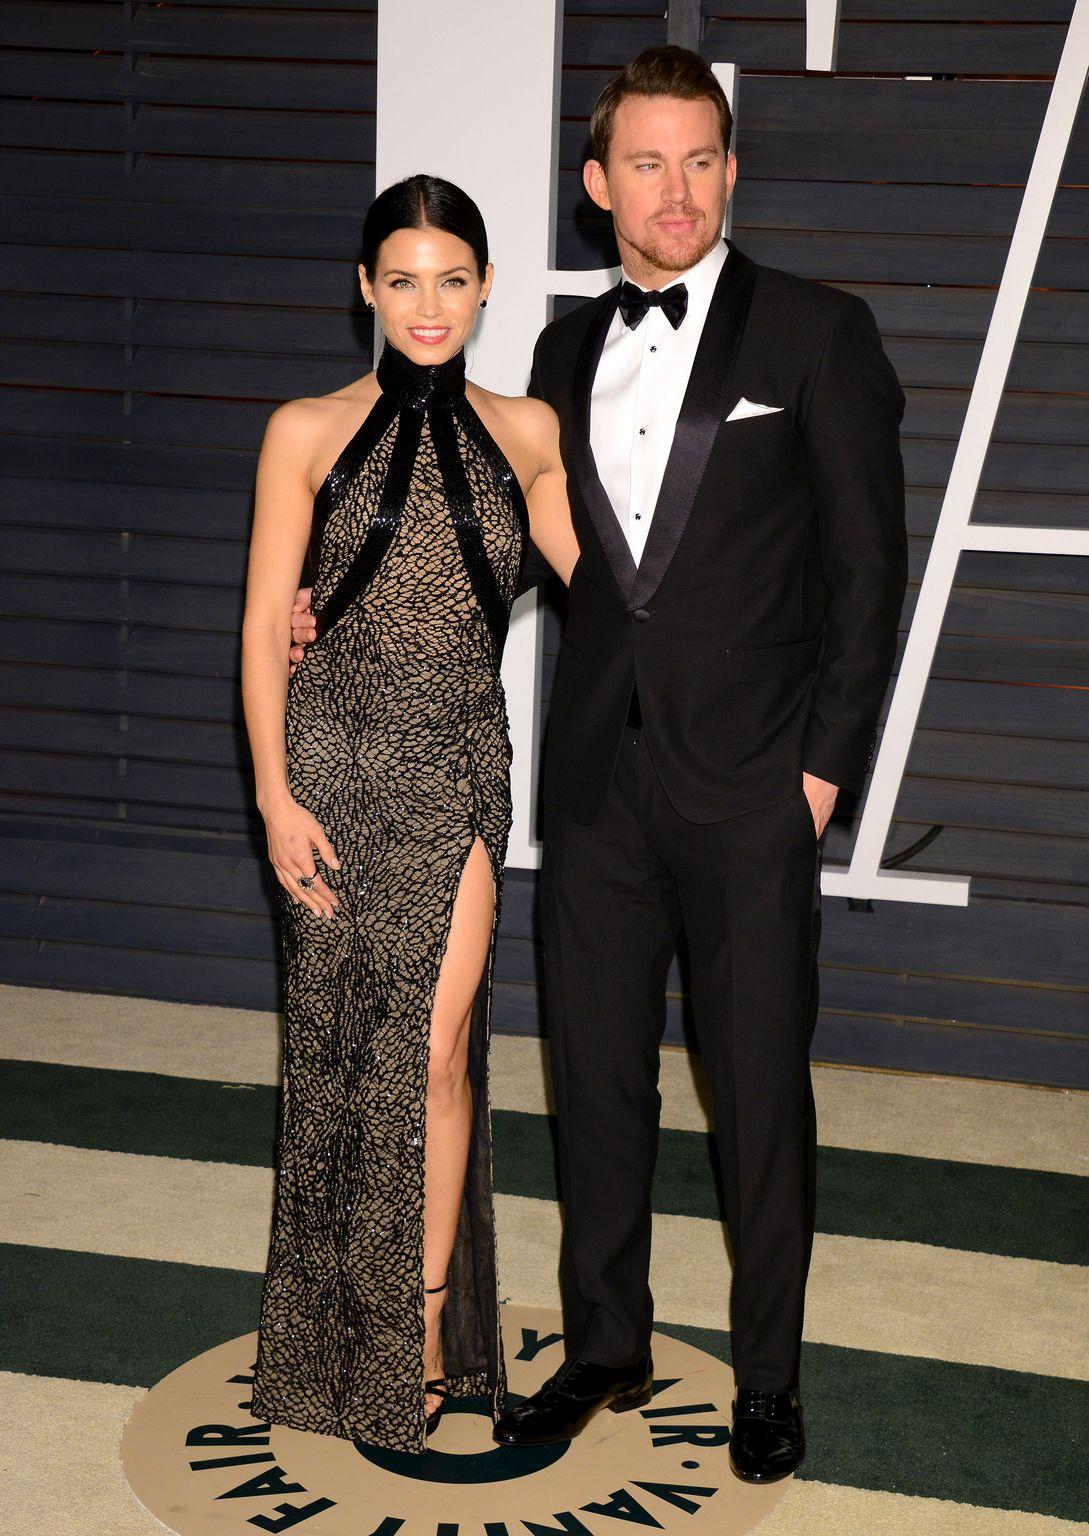 Channing Tatum and Jenna Dewan At Vanity Fair Oscar Party-2